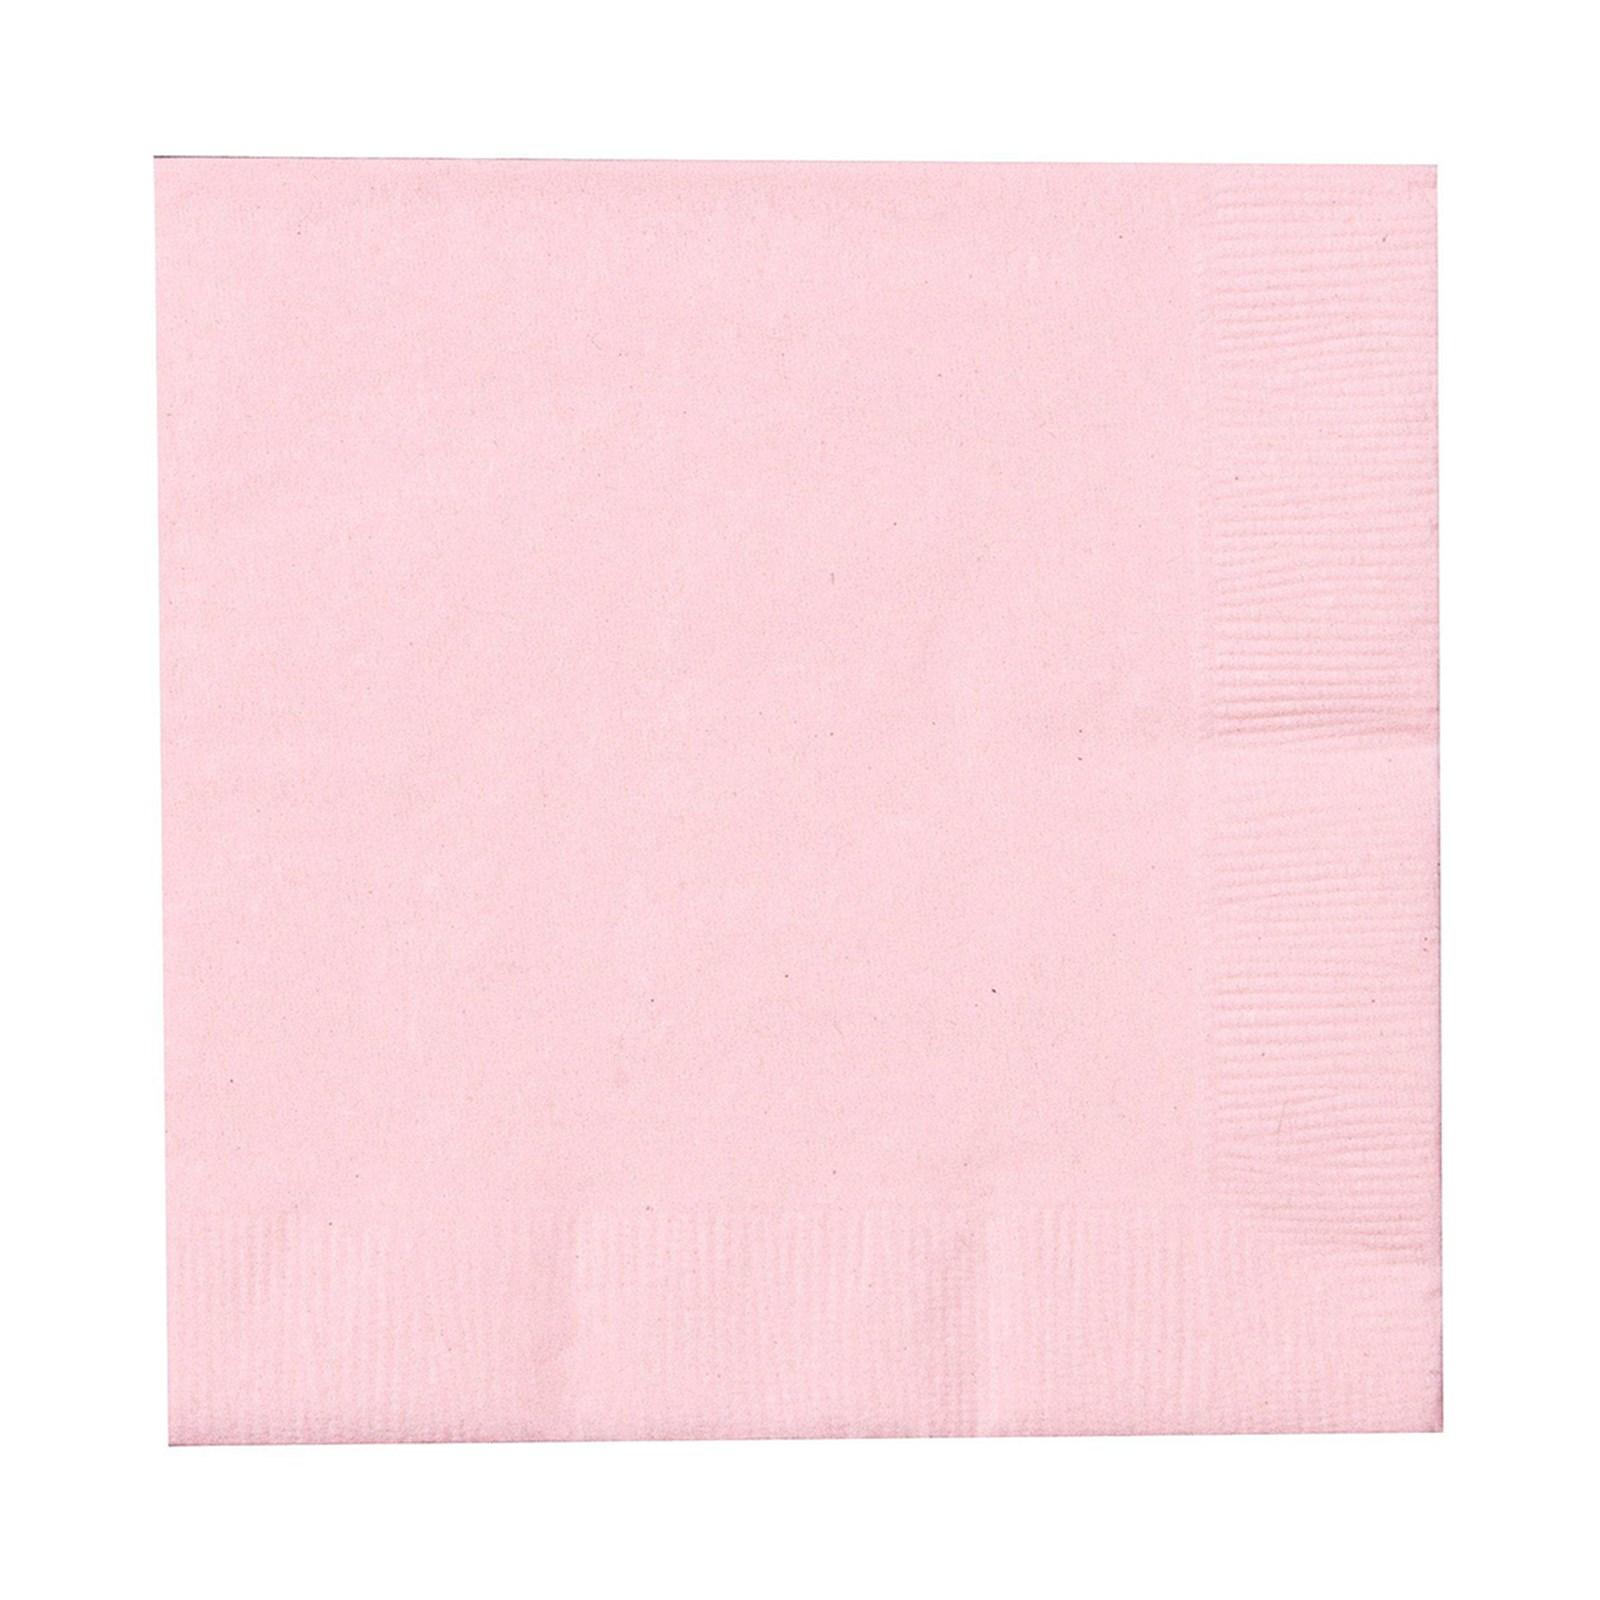 Classic Pink Light Pink Beverage Napkins 50 Count